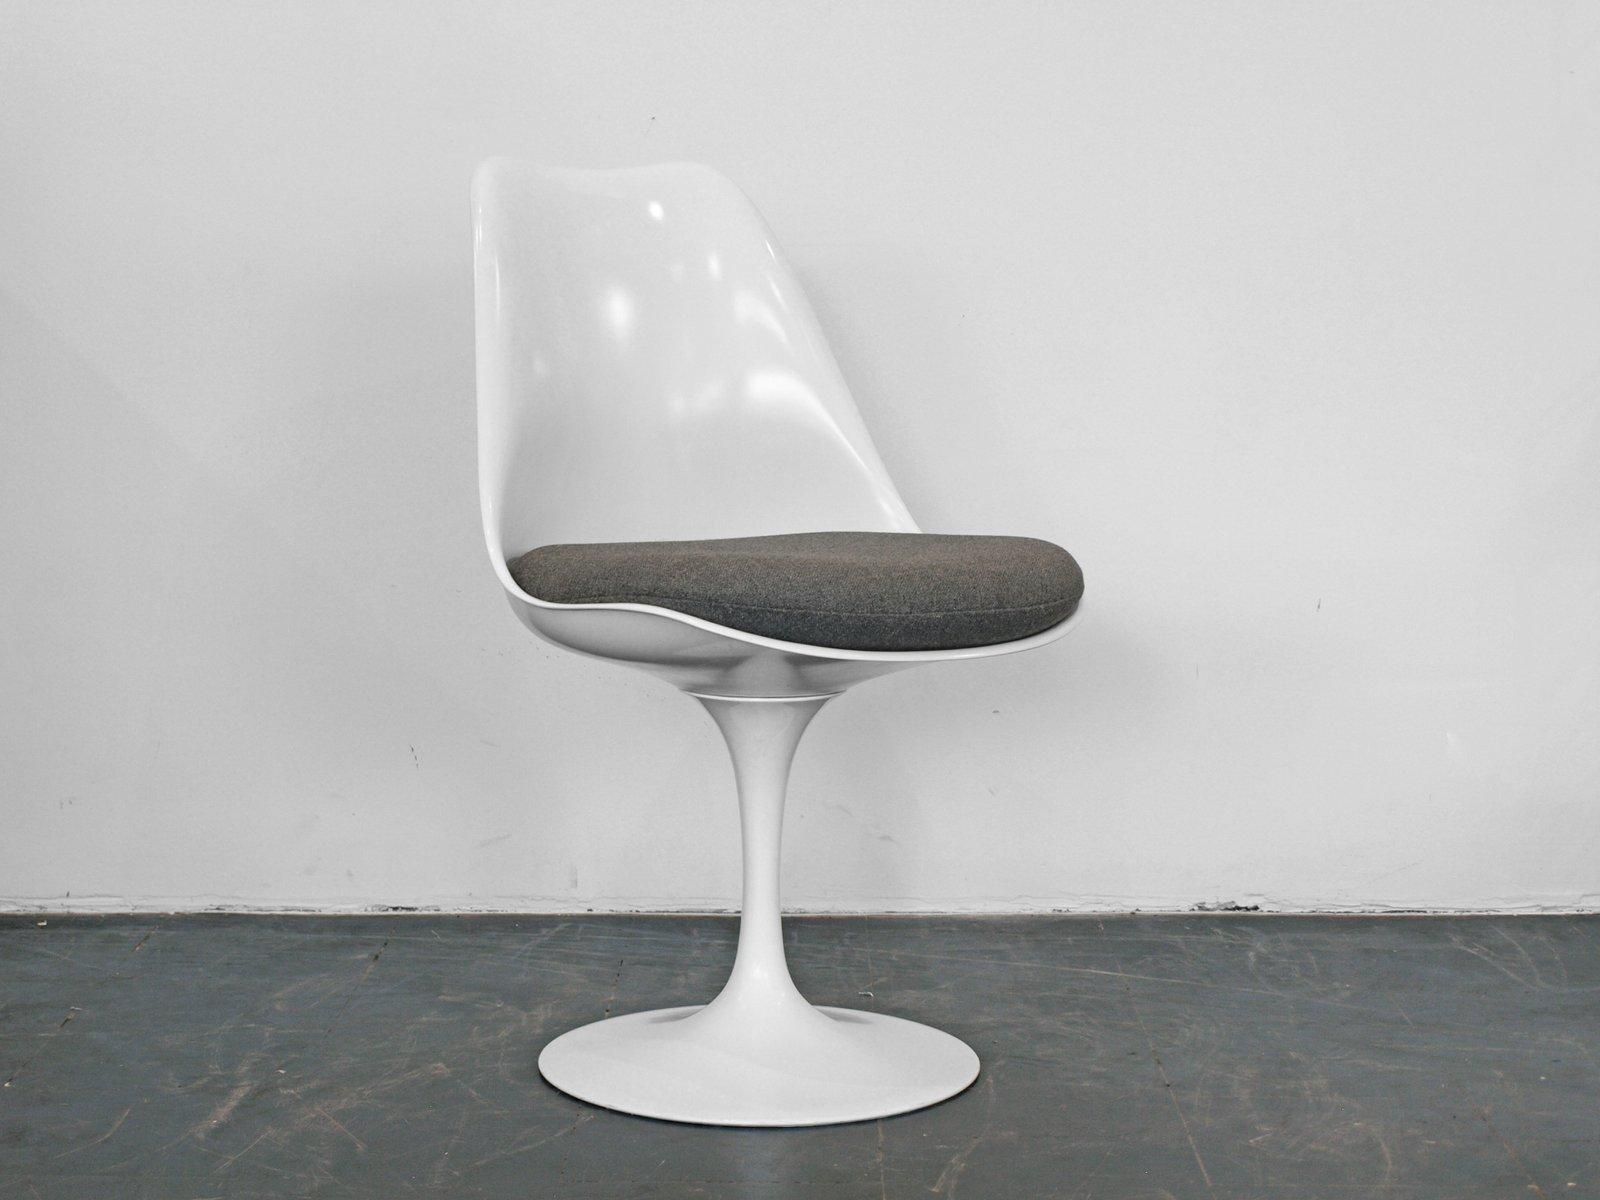 Saarinen Tulip Chair vintage white tulip chaireero saarinen for knoll for sale at